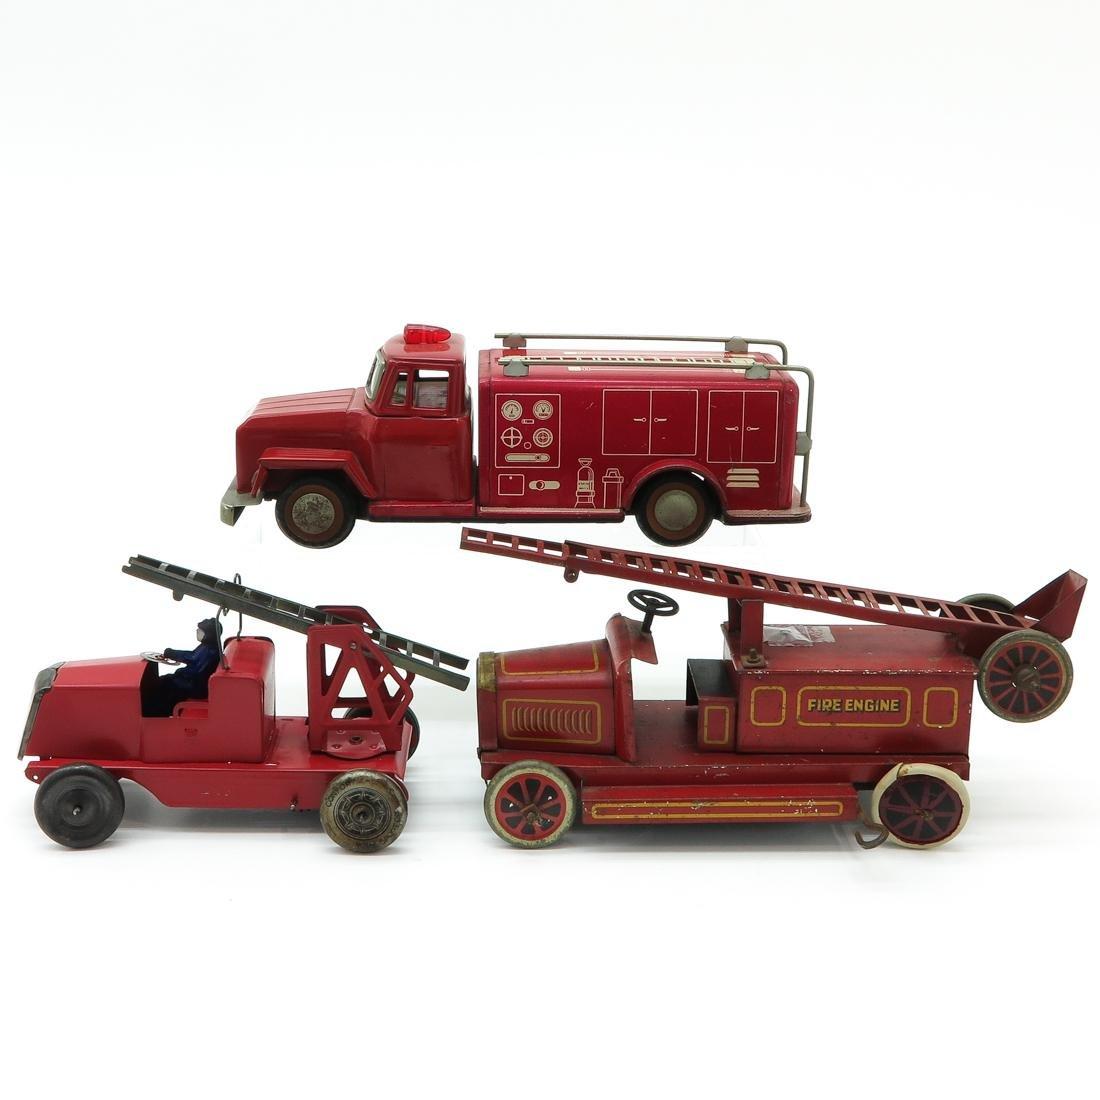 Lot of 3 Vintage Fire Trucks